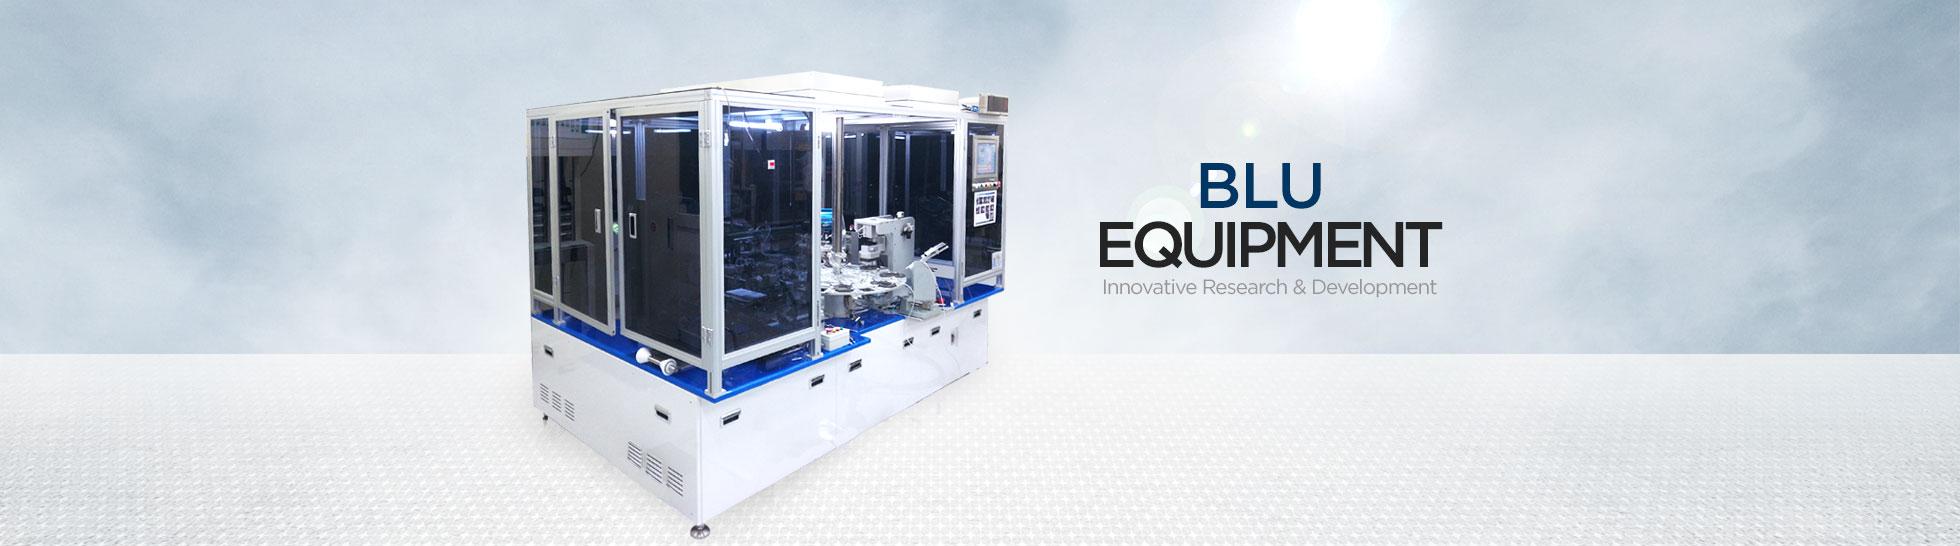 BLU Equipment